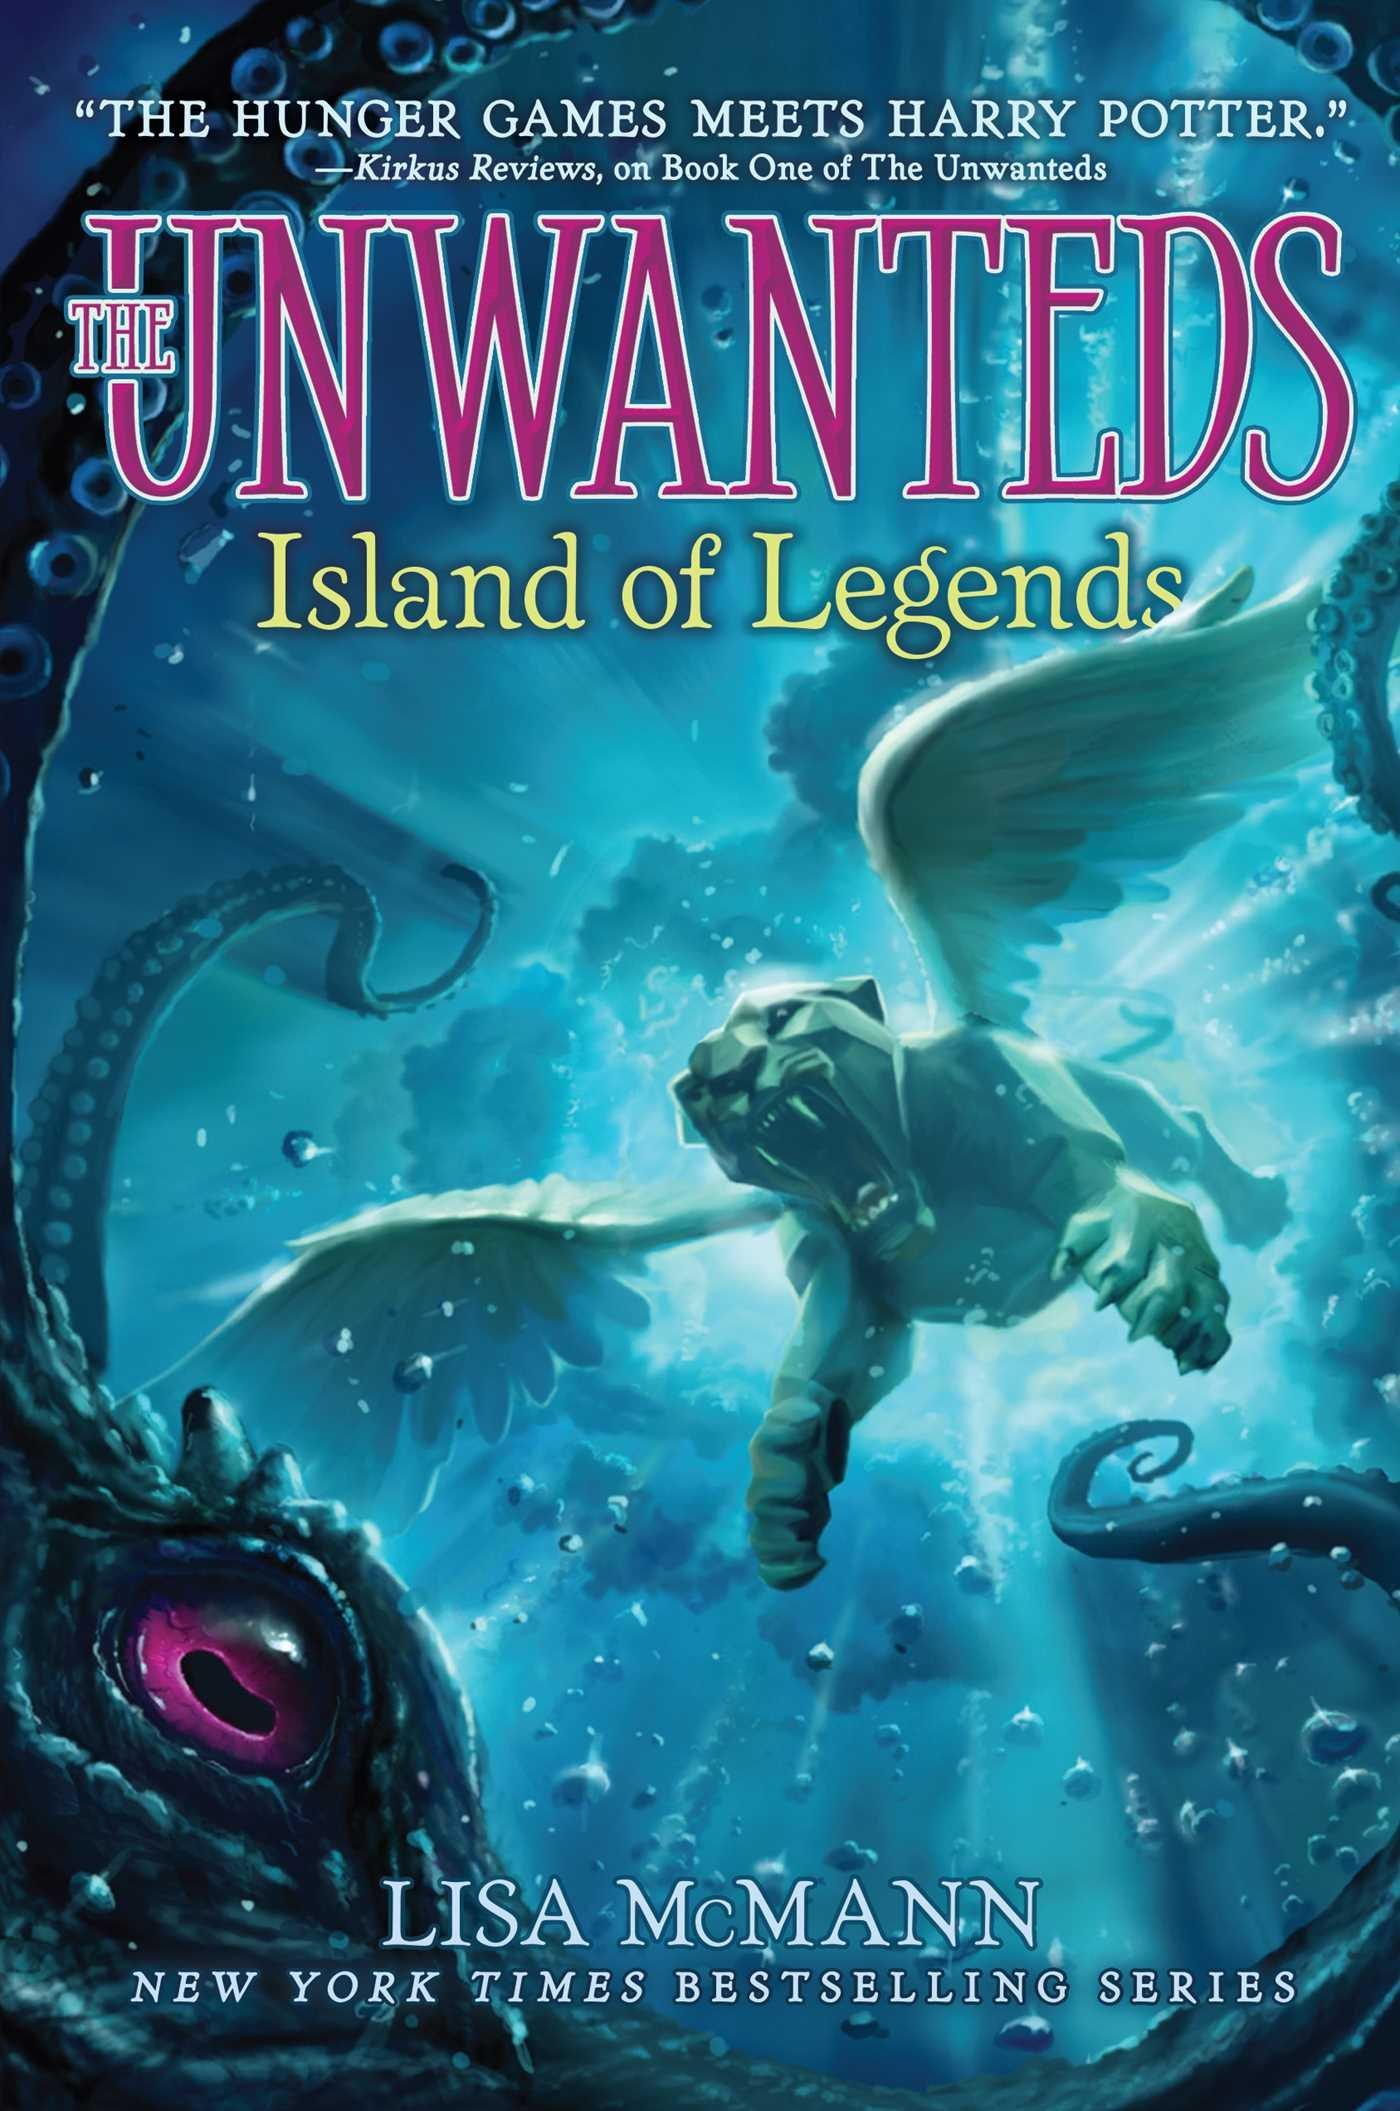 Island of Legends (The Unwanteds): Lisa McMann: 9781442493292 ...